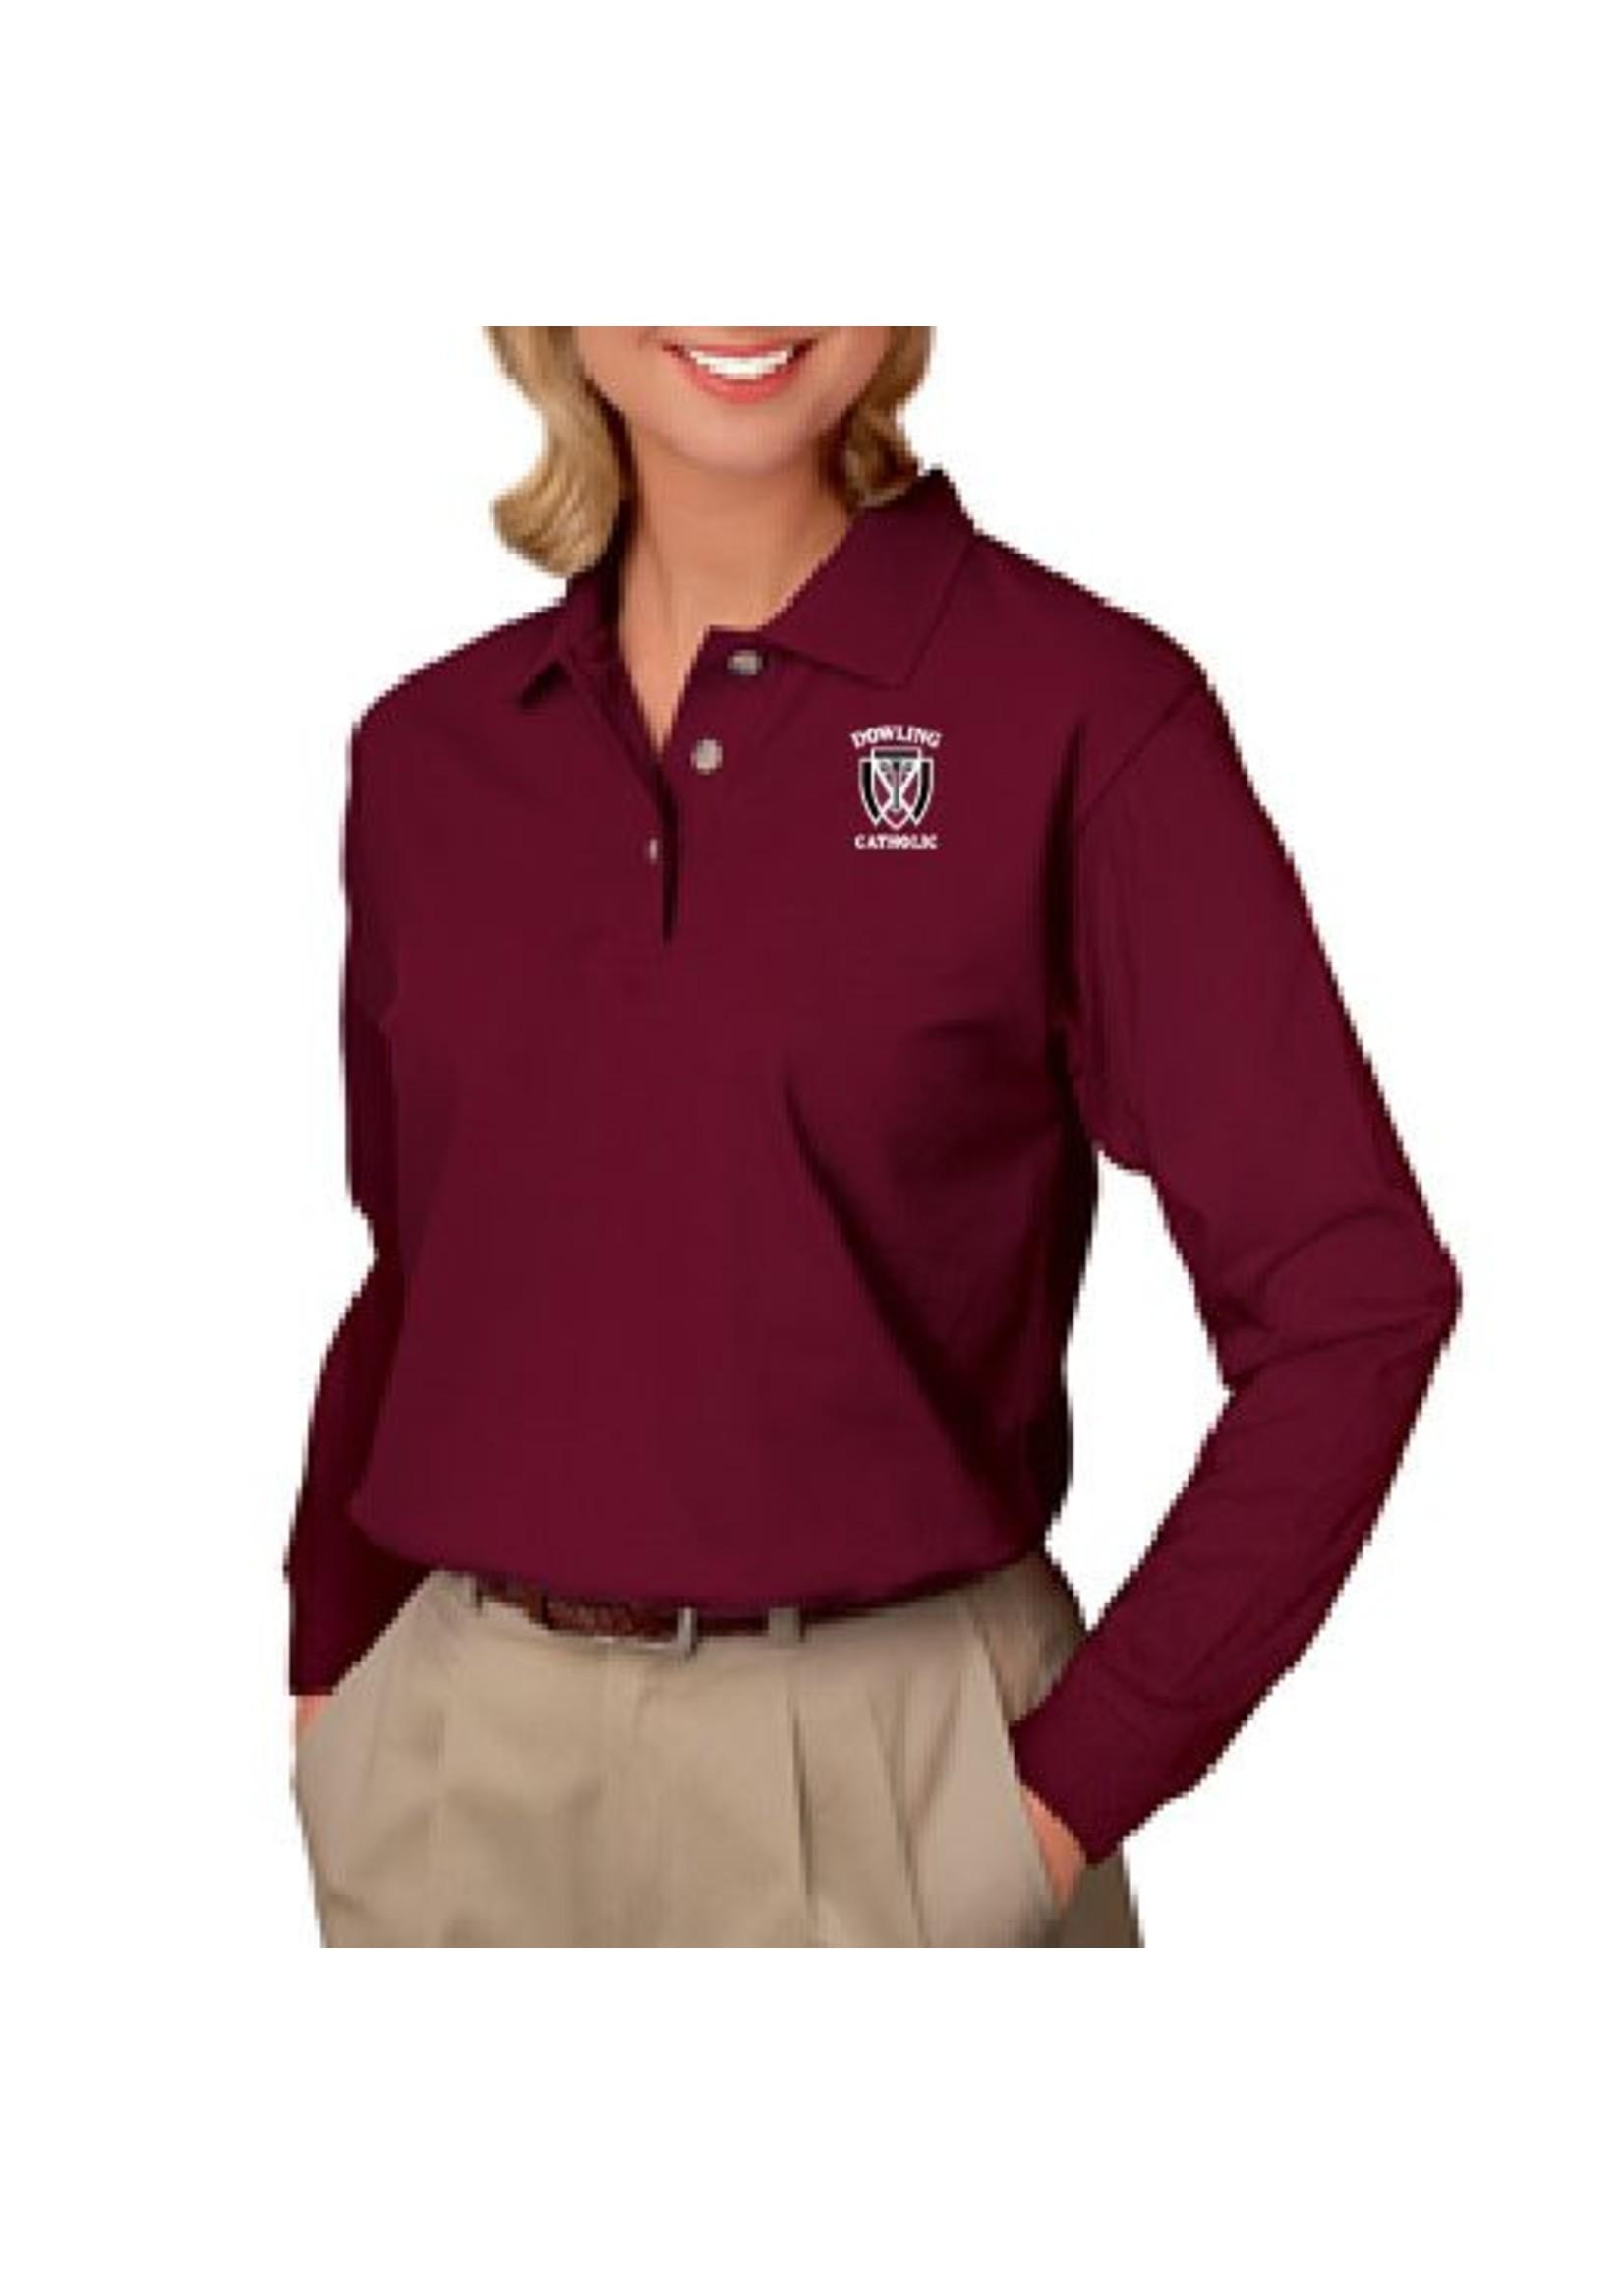 Blue Generation Women's Long Sleeve Cotton Polo - ONLINE